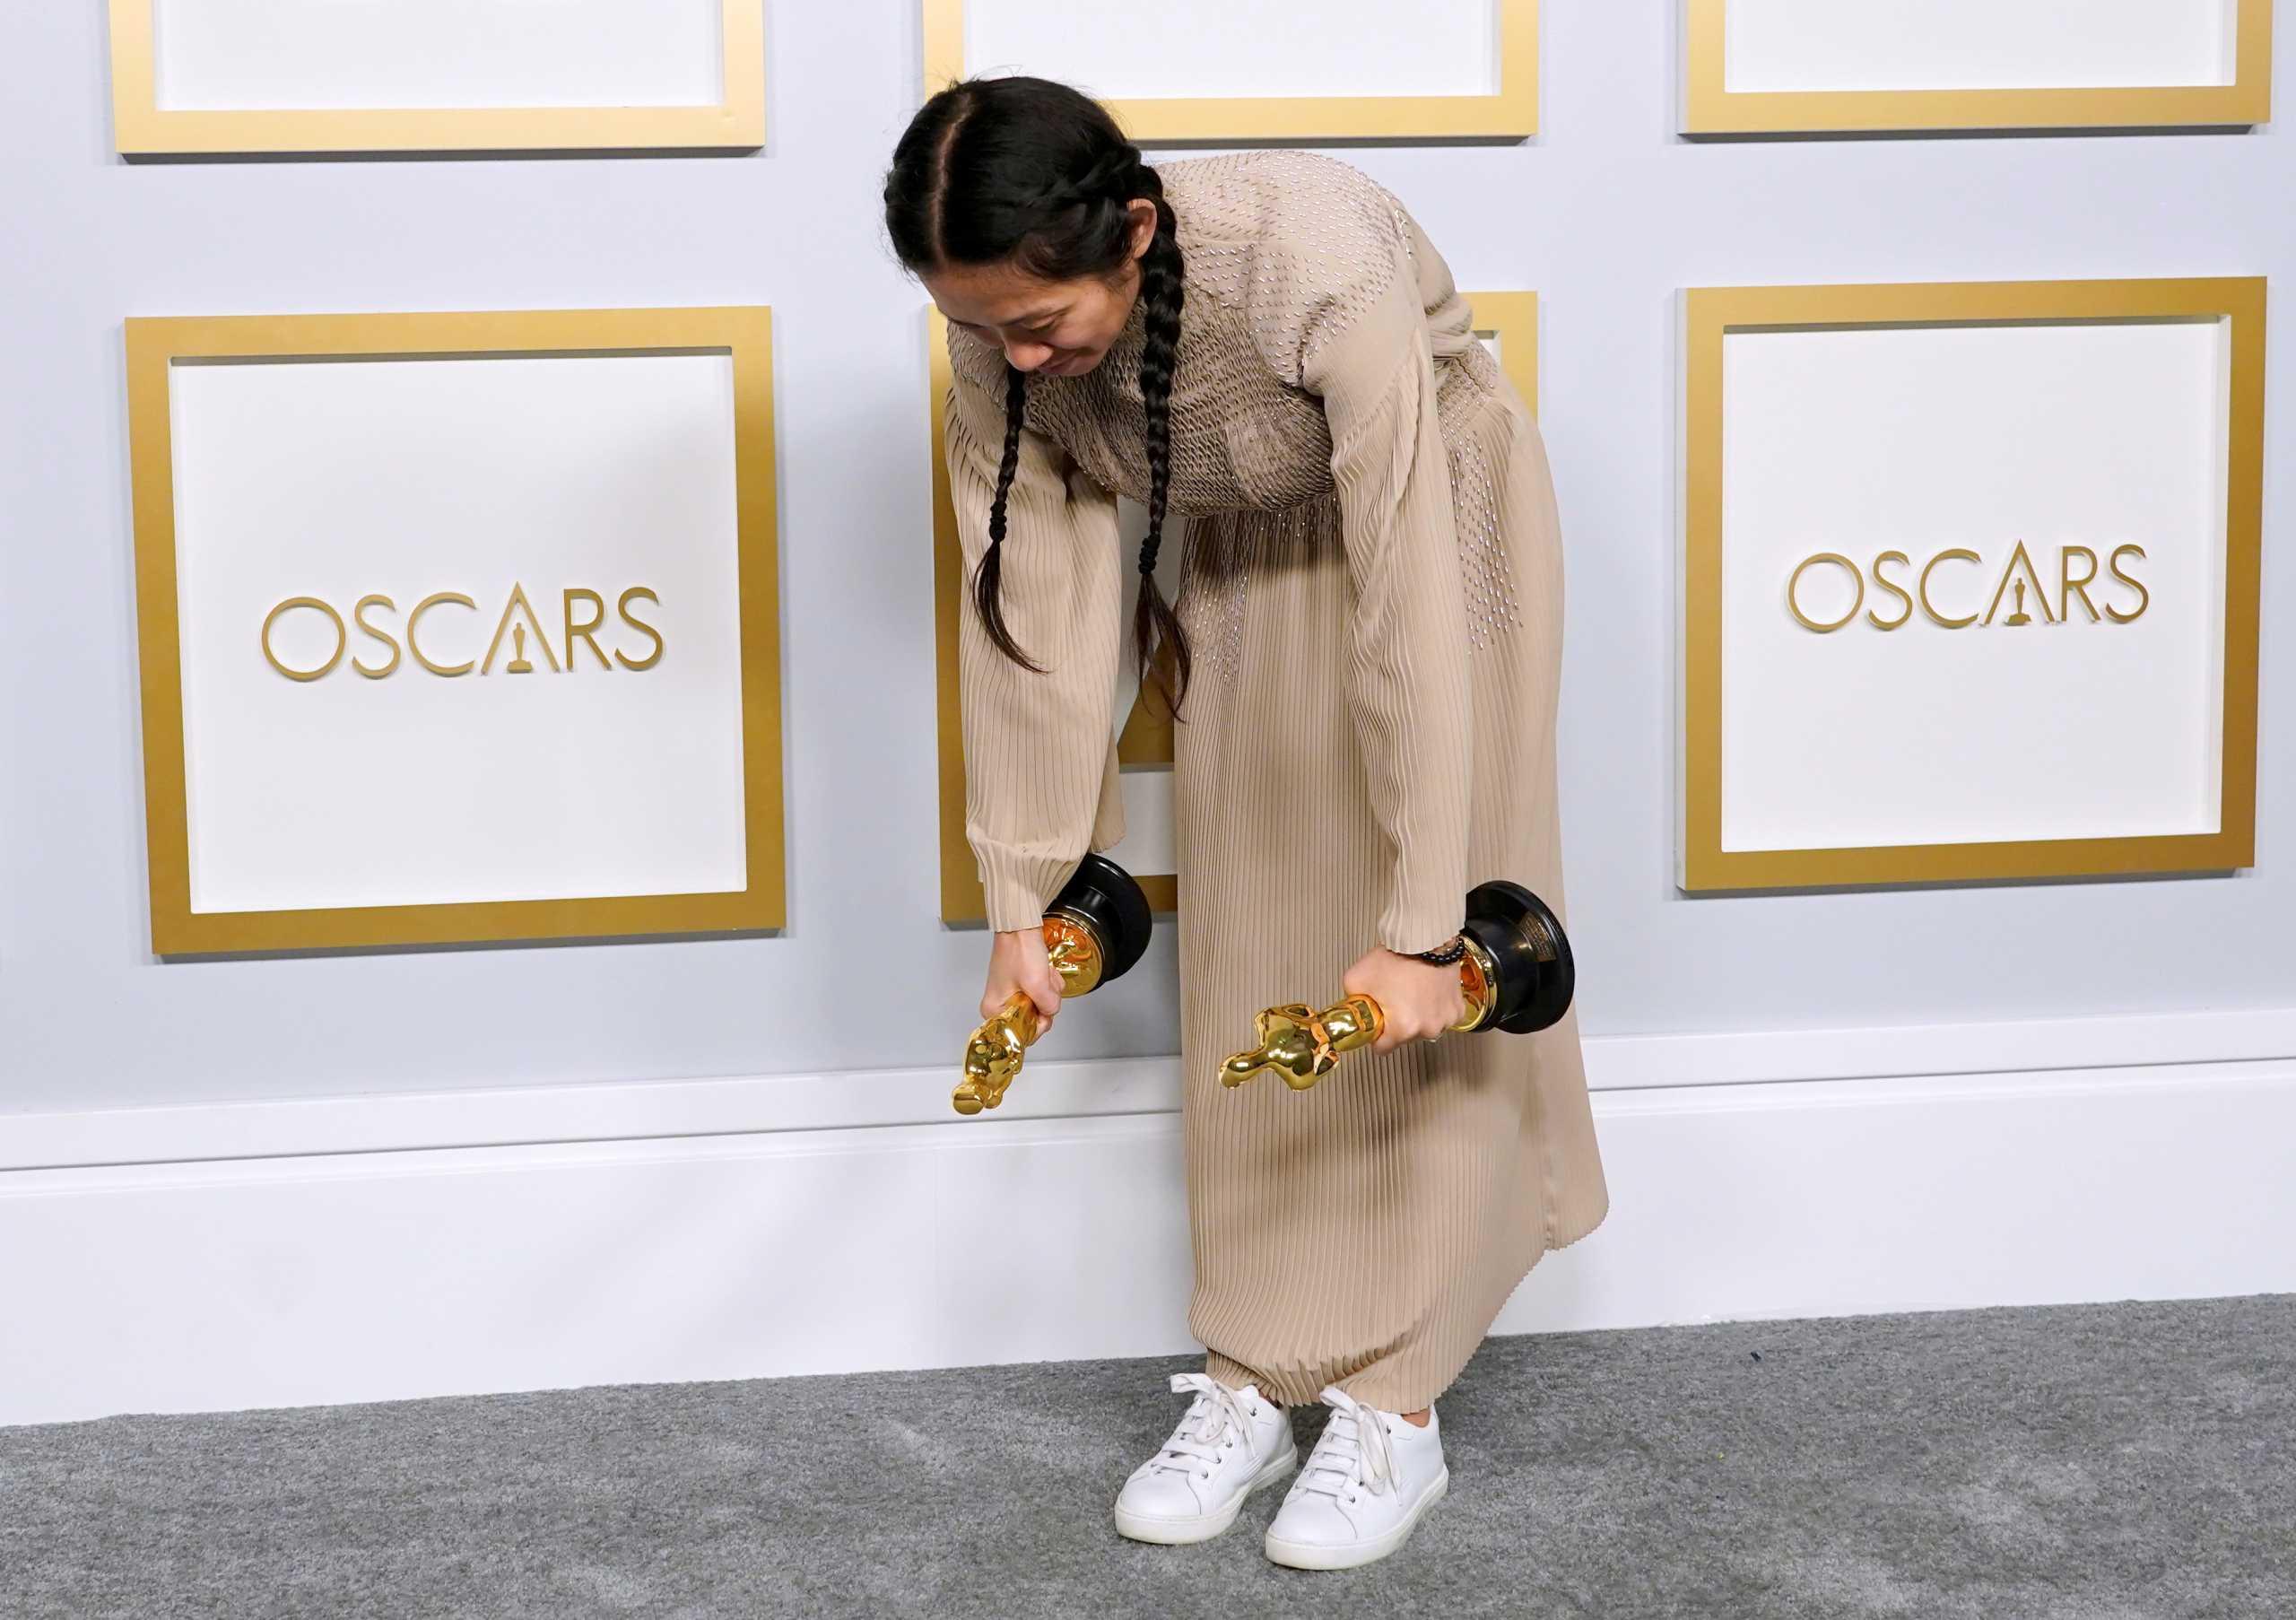 Oscars 2021: Ποιοι πήραν τα βραβεία – Όλοι οι νικητές